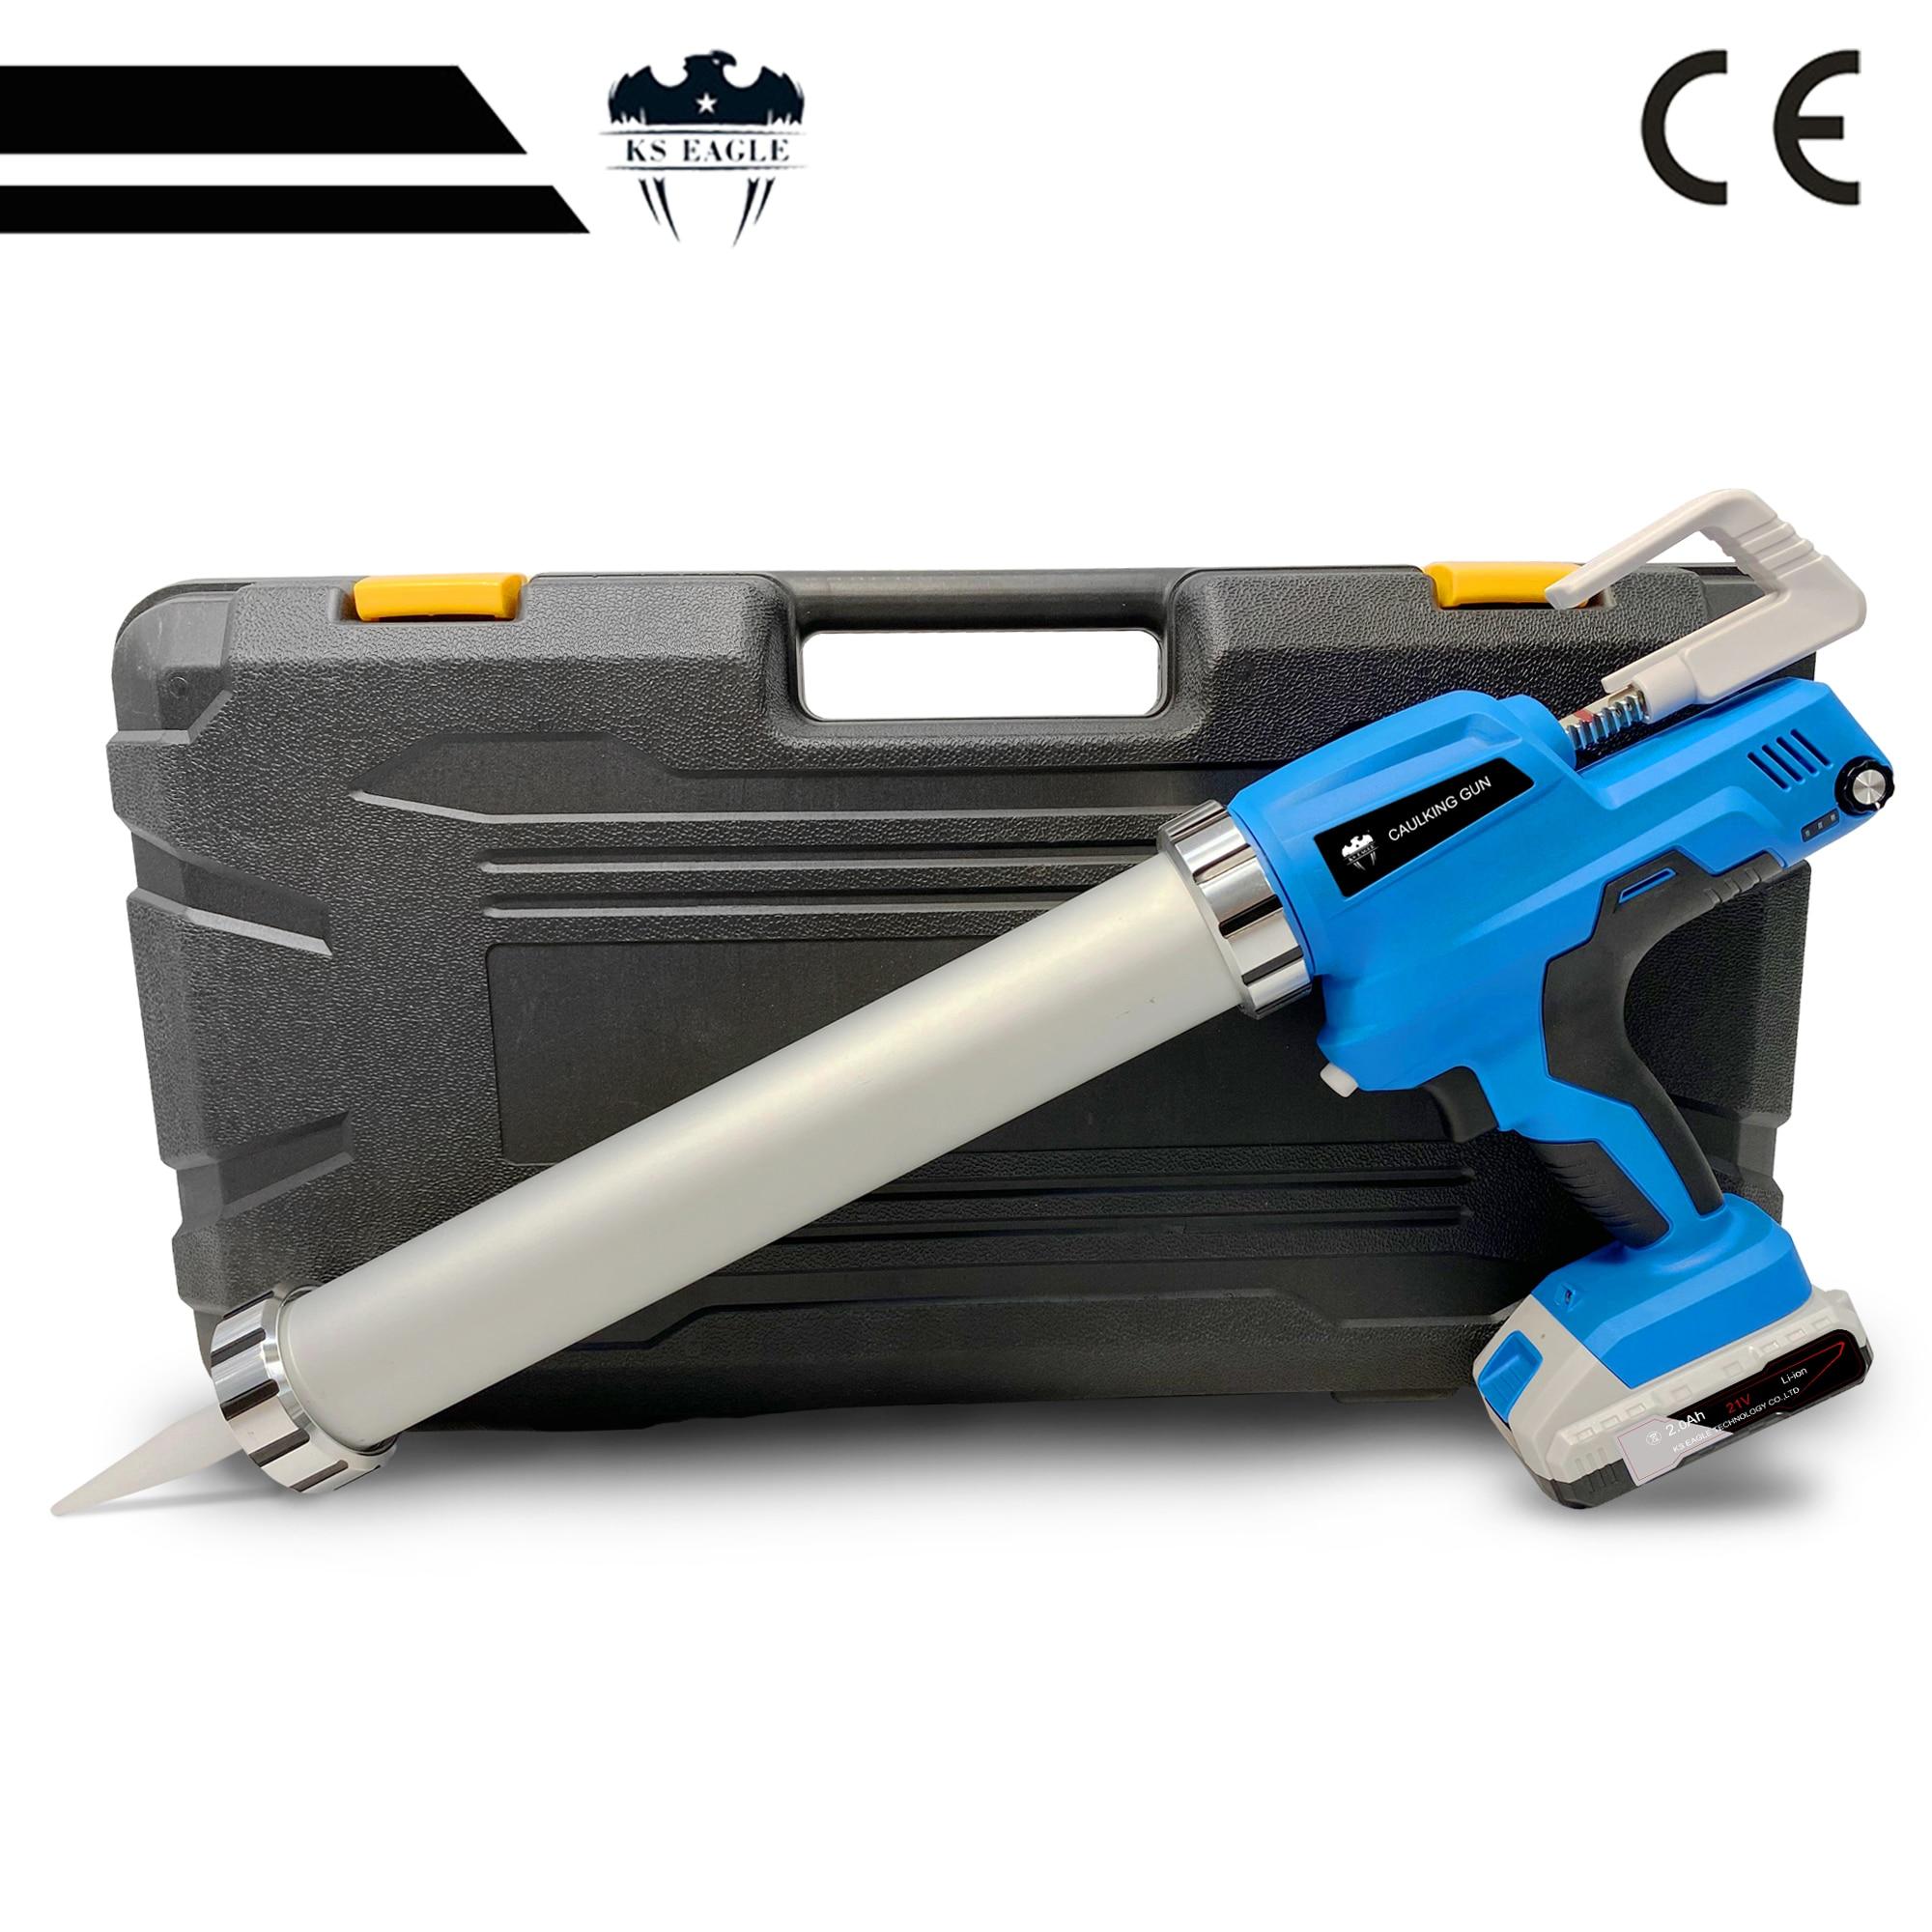 Electric Cordless Caulking Gun With Li-Batteries 21V  DIY Electric CorHandheld Glass Hard Rubber Sealant Guns Tool